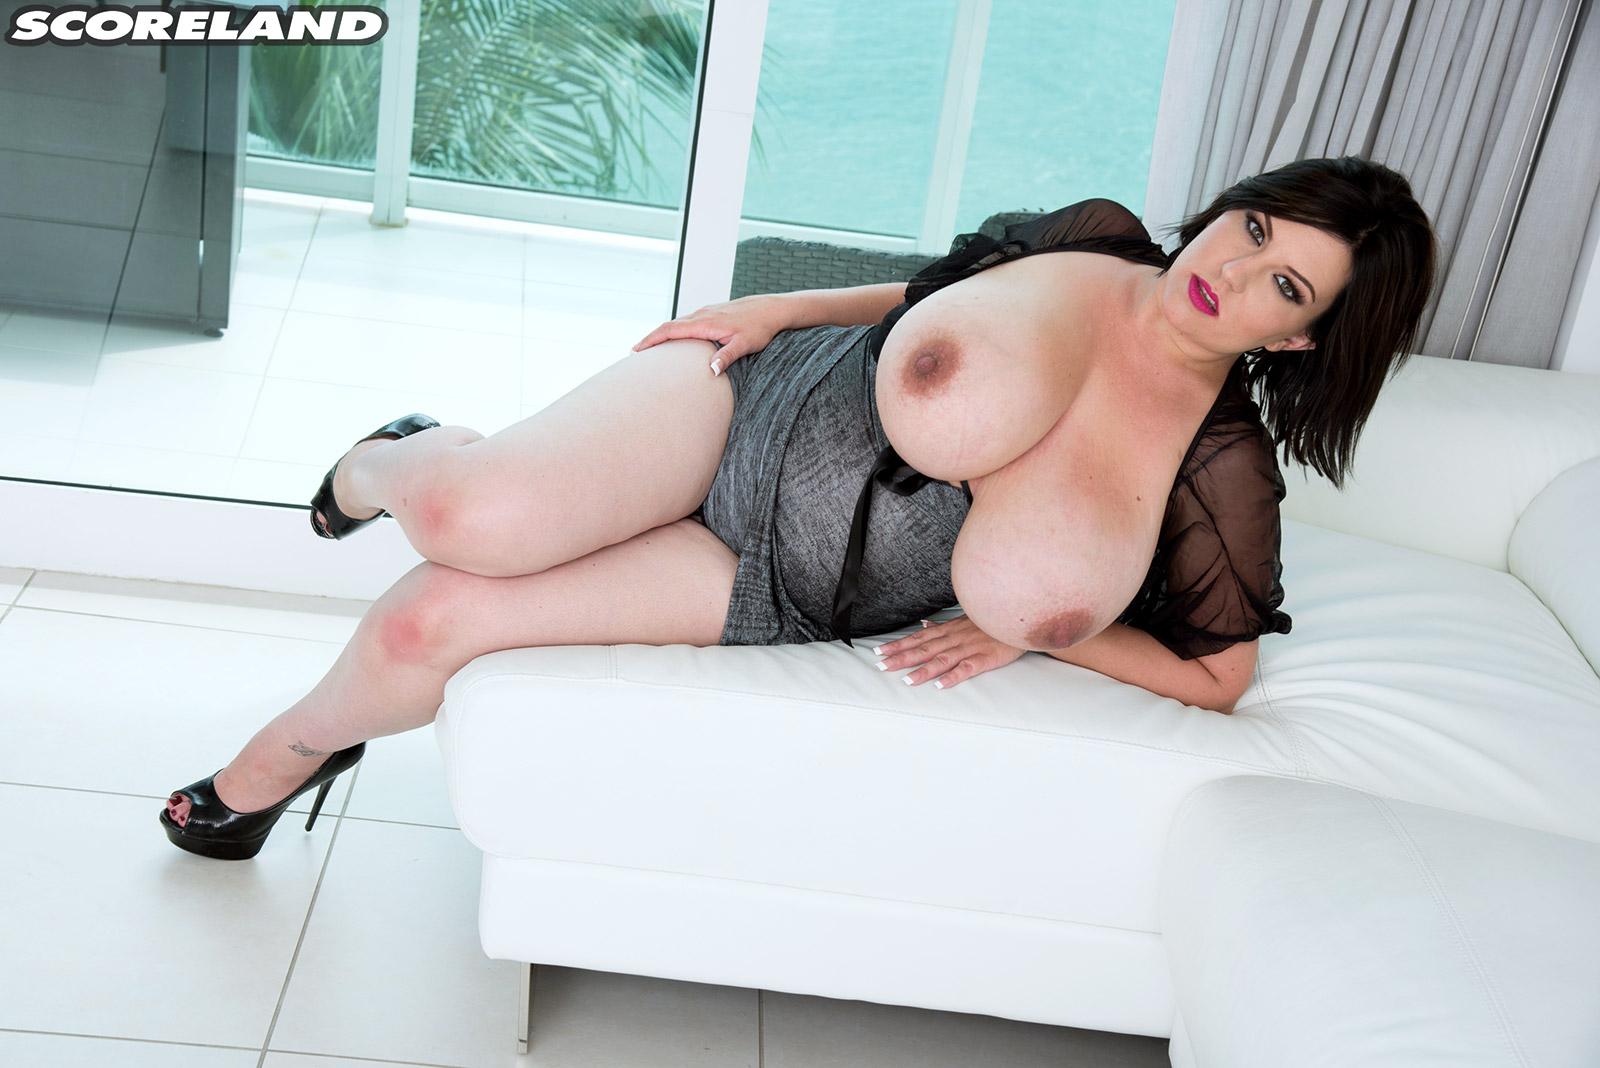 Paige turner having sex domination porn pics